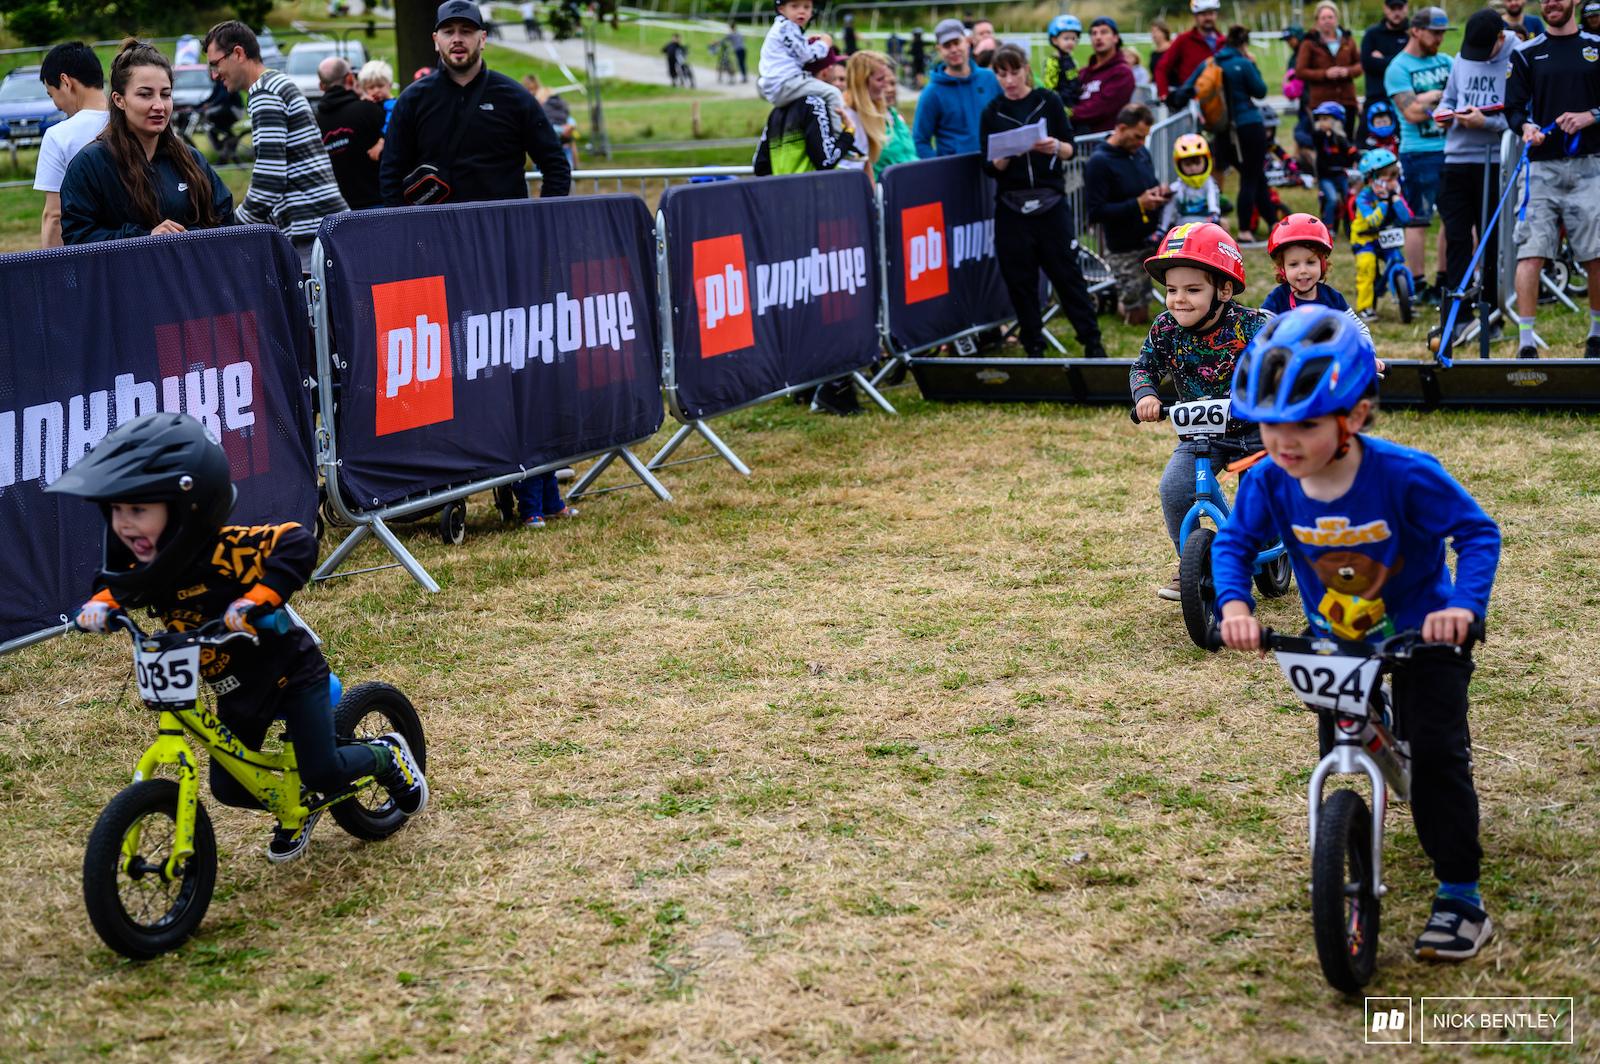 Even balance bikes conquer the start gate